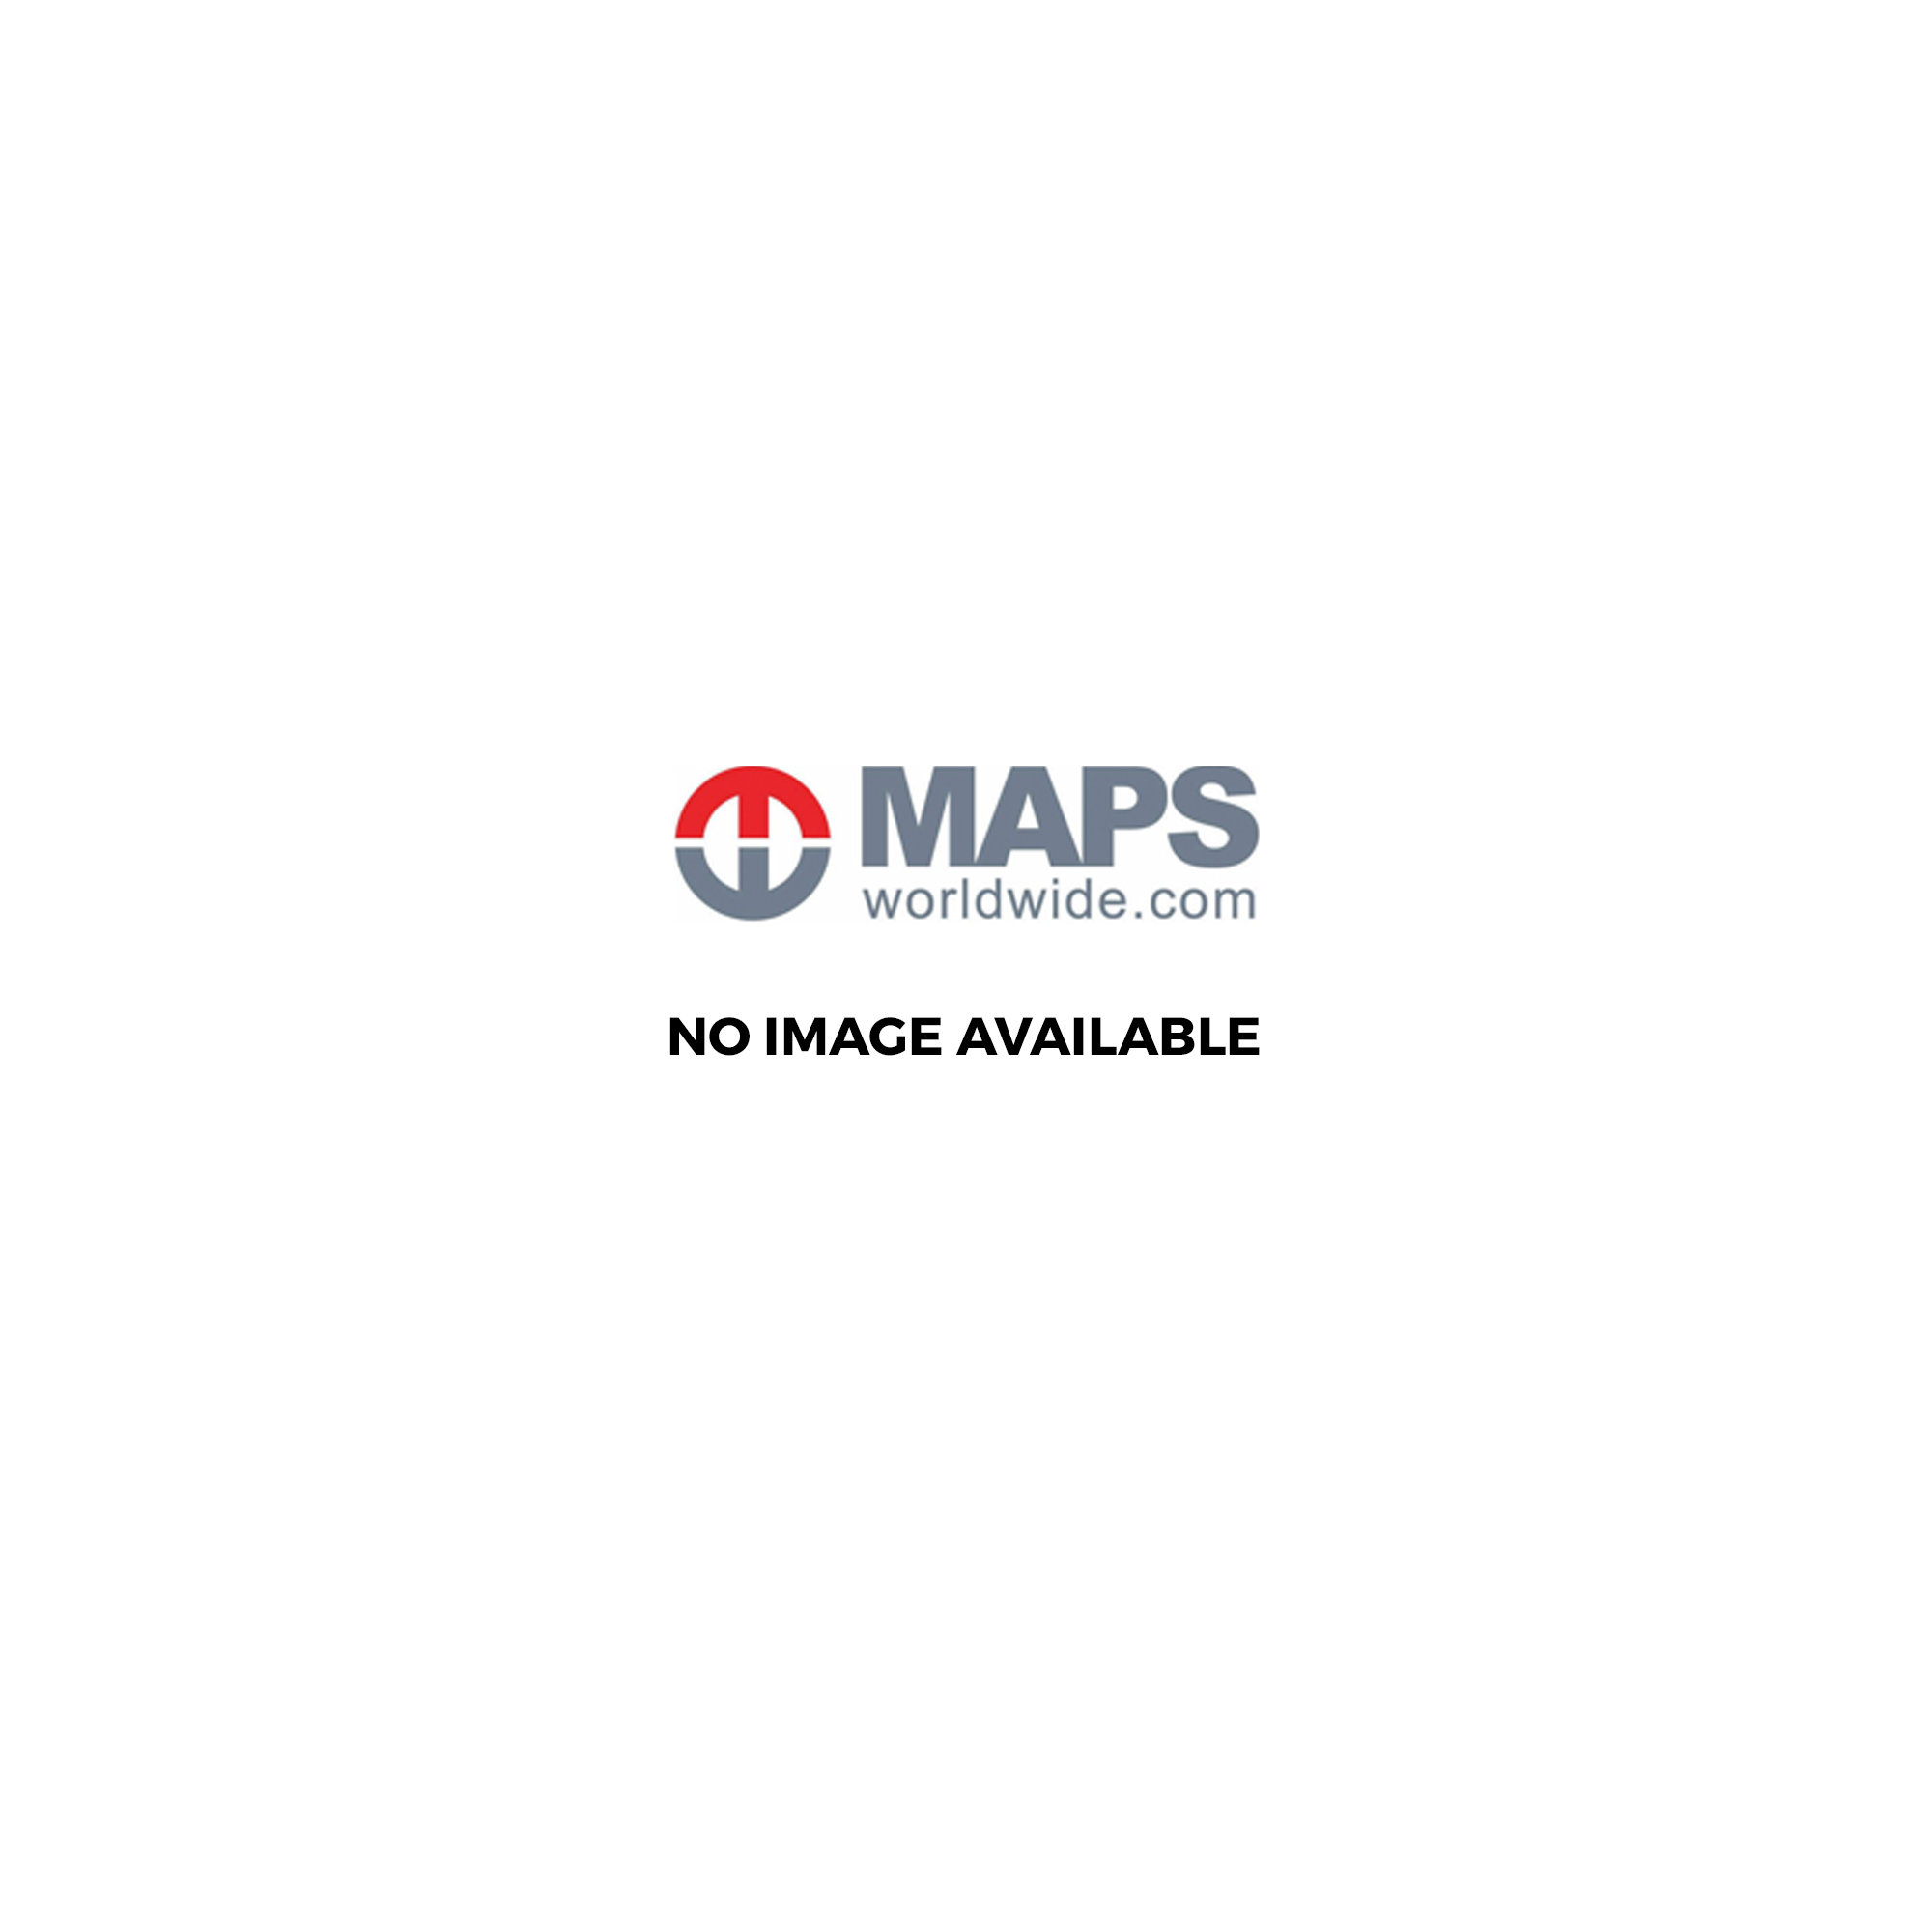 south africa namibia botswana marco polo map